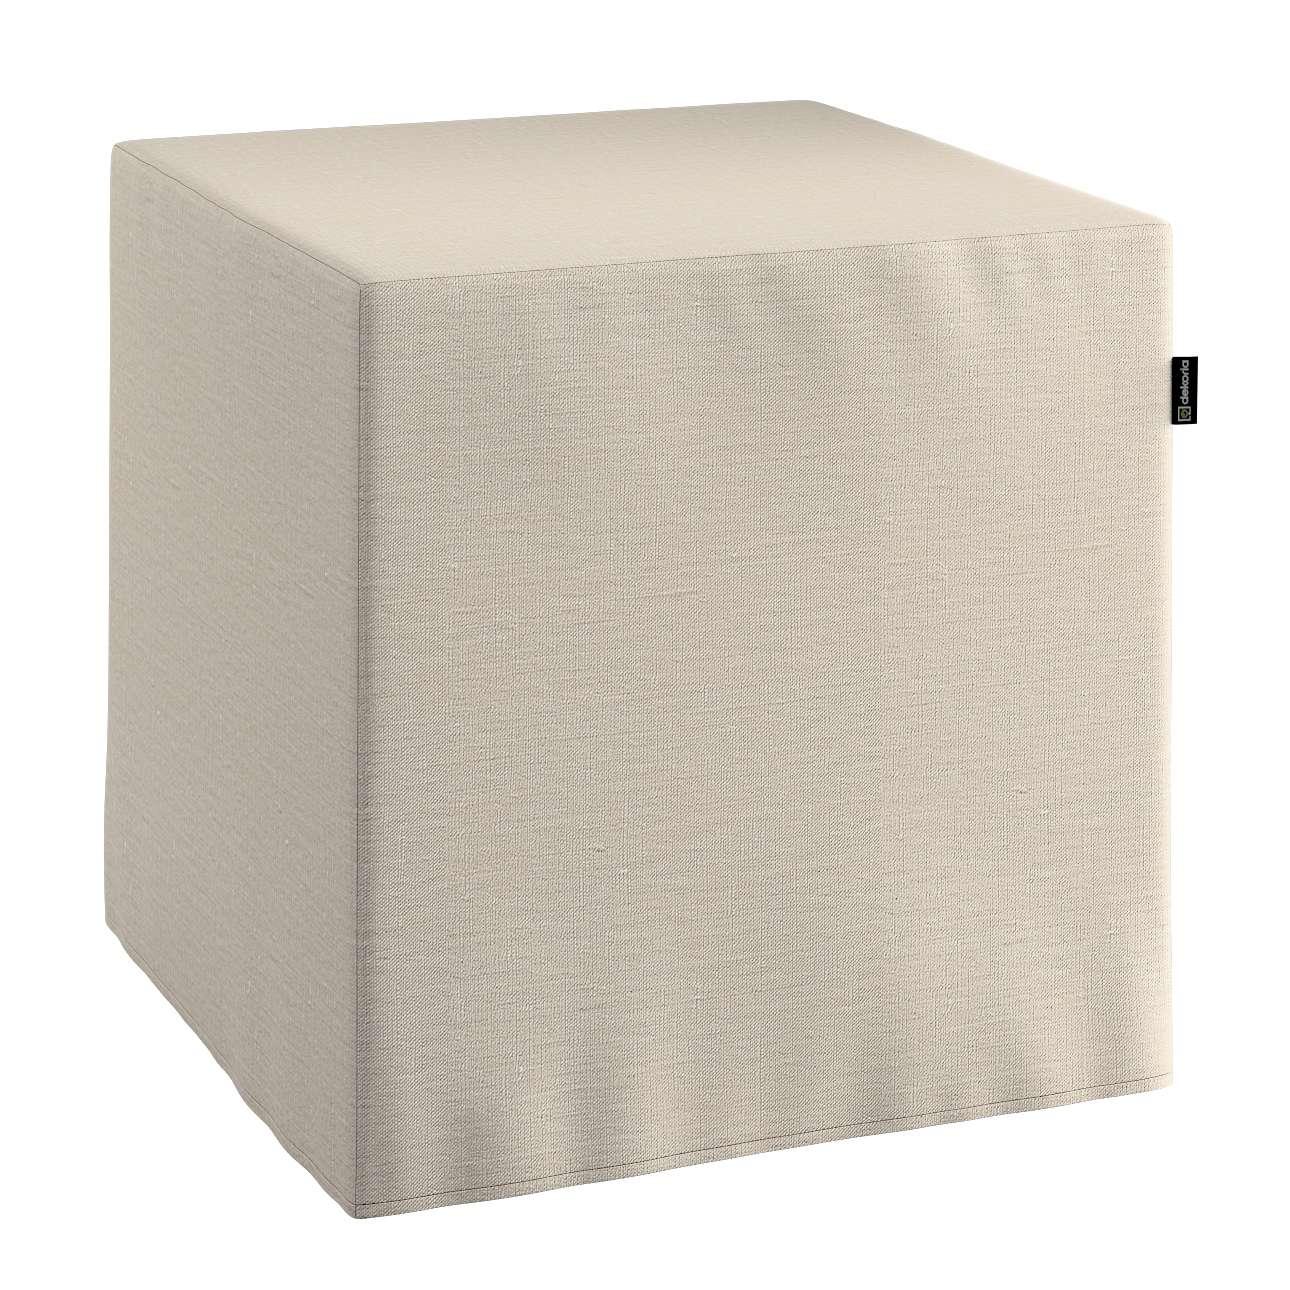 Pufas 40 x 40 x 40 cm kolekcijoje Linen , audinys: 392-05